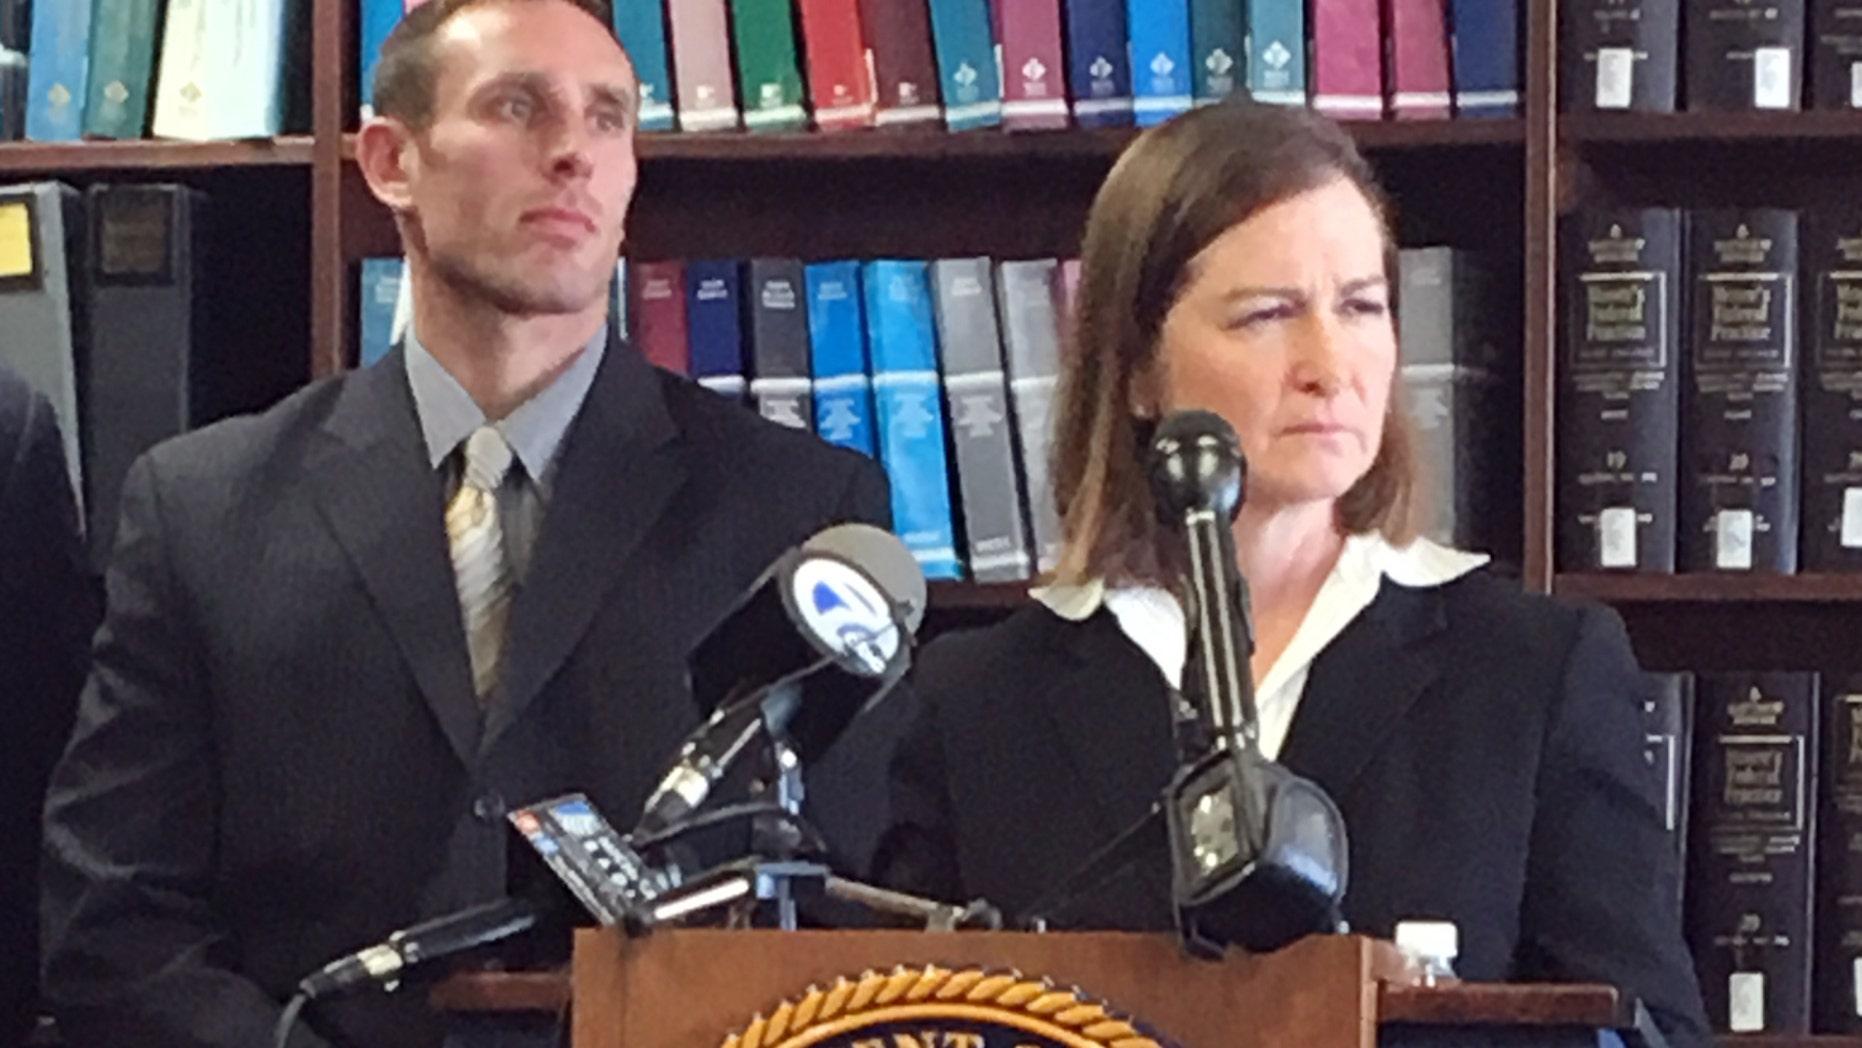 March 29, 2016: U.S. Attorney Barbara McQuade discusses an alleged bribery and kickback scheme involving supplies for Detroit's public schools